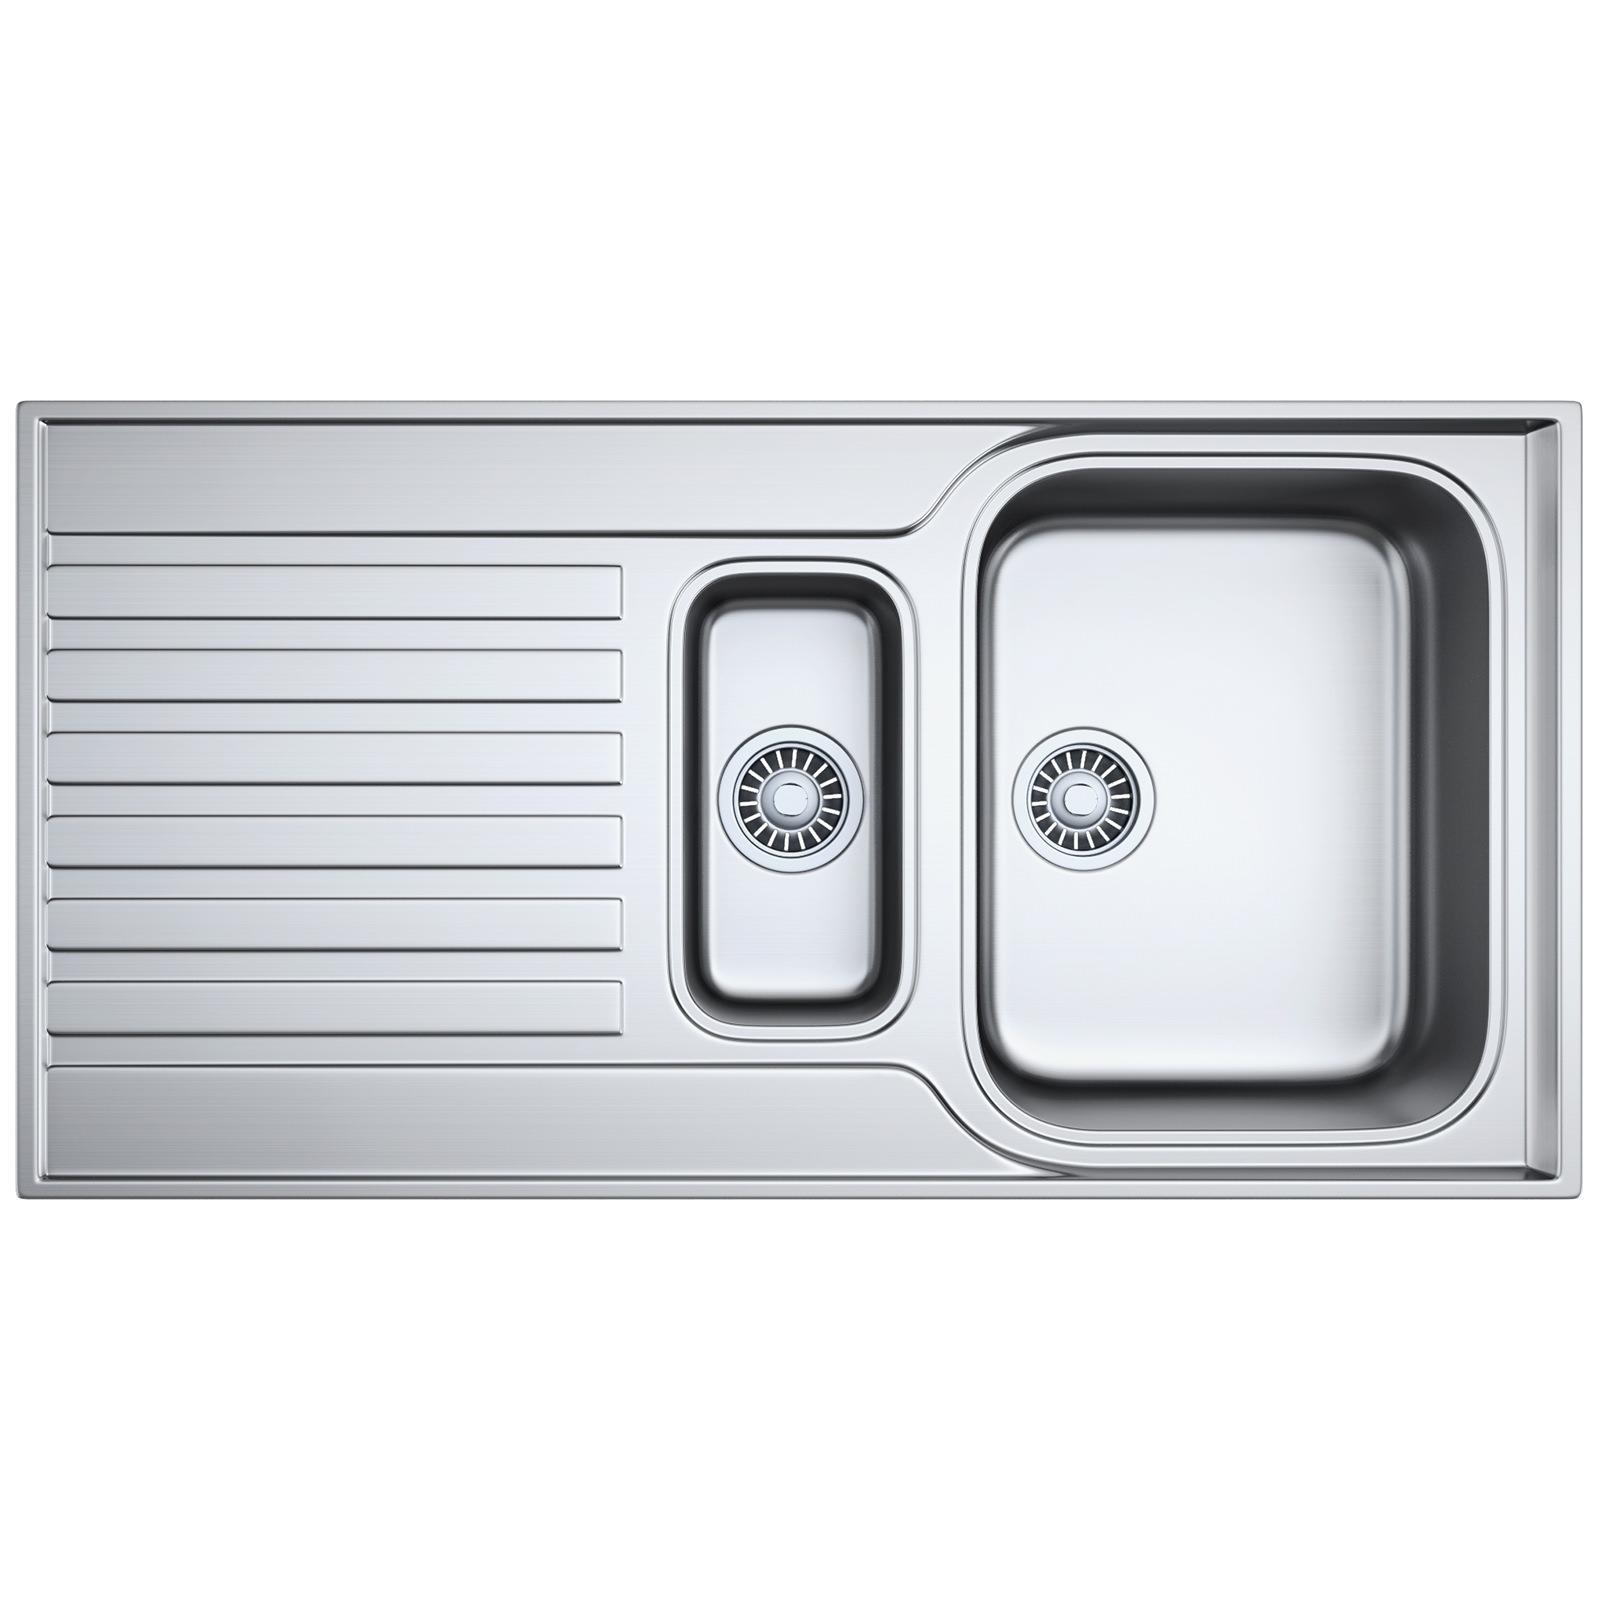 Franke Inset Sink : Franke Ascona ASX 651 Stainless Steel 1.5 Bowl Inset Sink 101.0277 ...